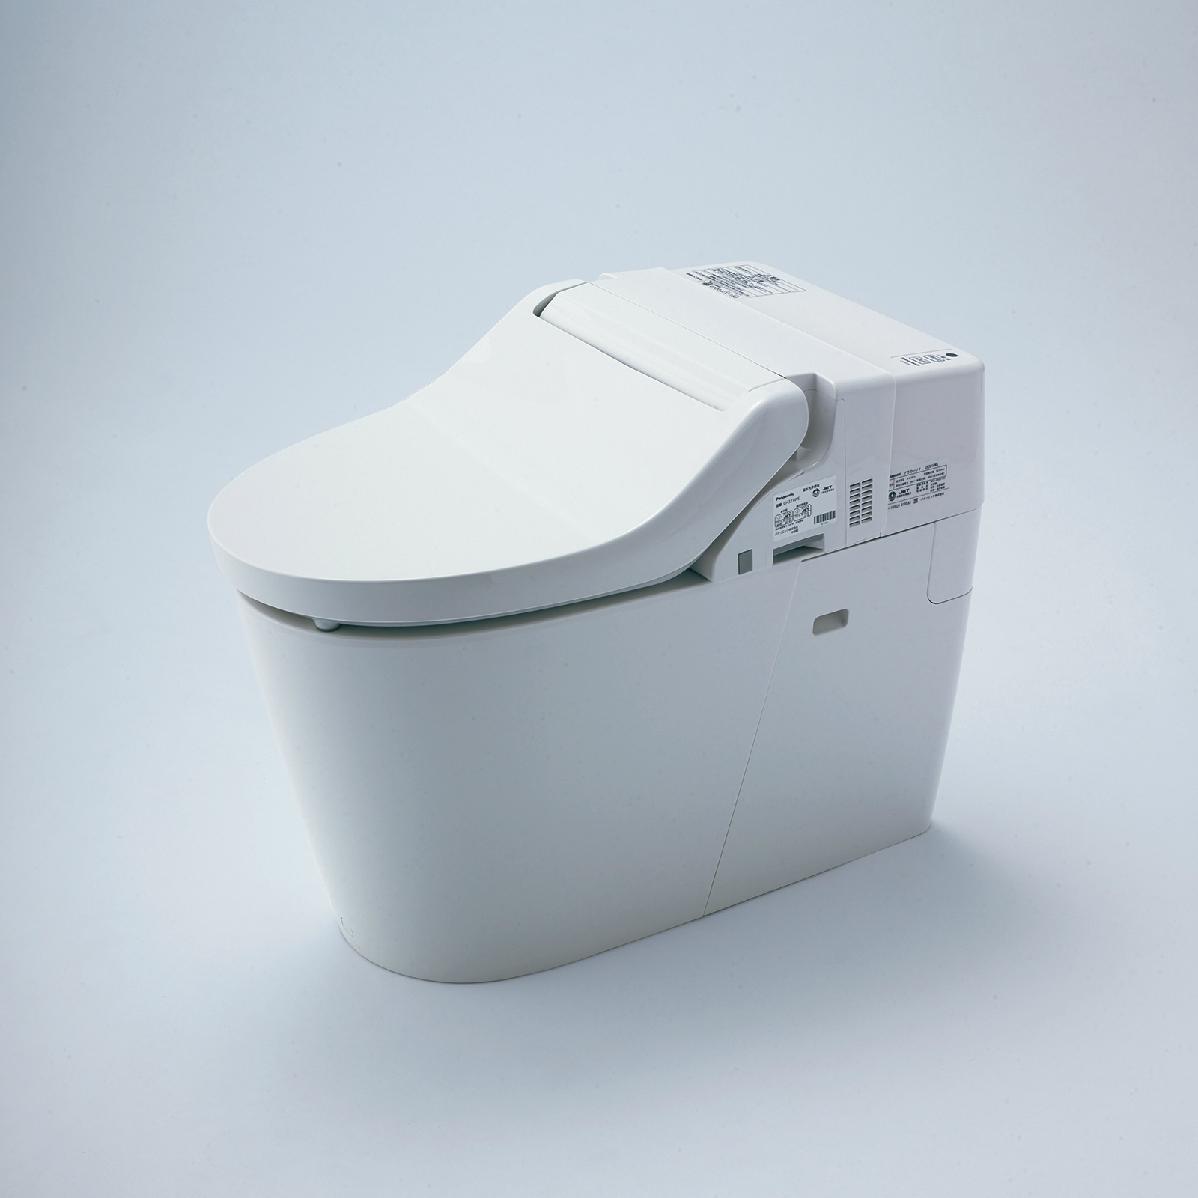 PANASONIC XCH3018WS アラウーノV 標準タイプ手洗無タイプ+V専用暖房便座セット  床排水芯200mm ホワイト色 北海道、沖縄及び離島は、別途送料がかかります。